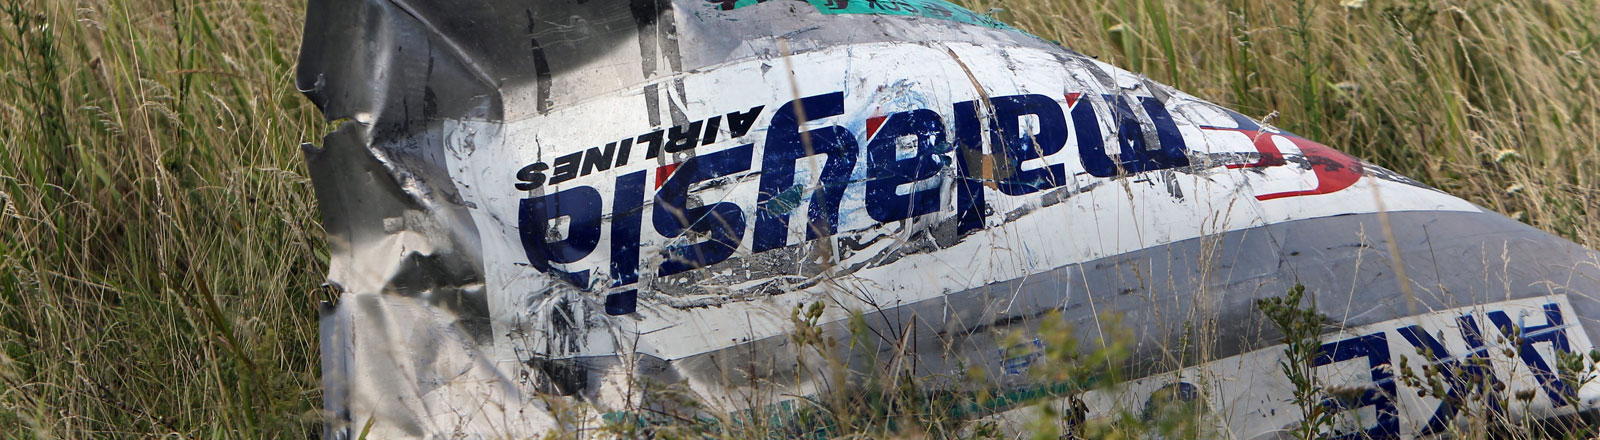 Ein Teil des Malaysian-Airline-Linienflugs MH17